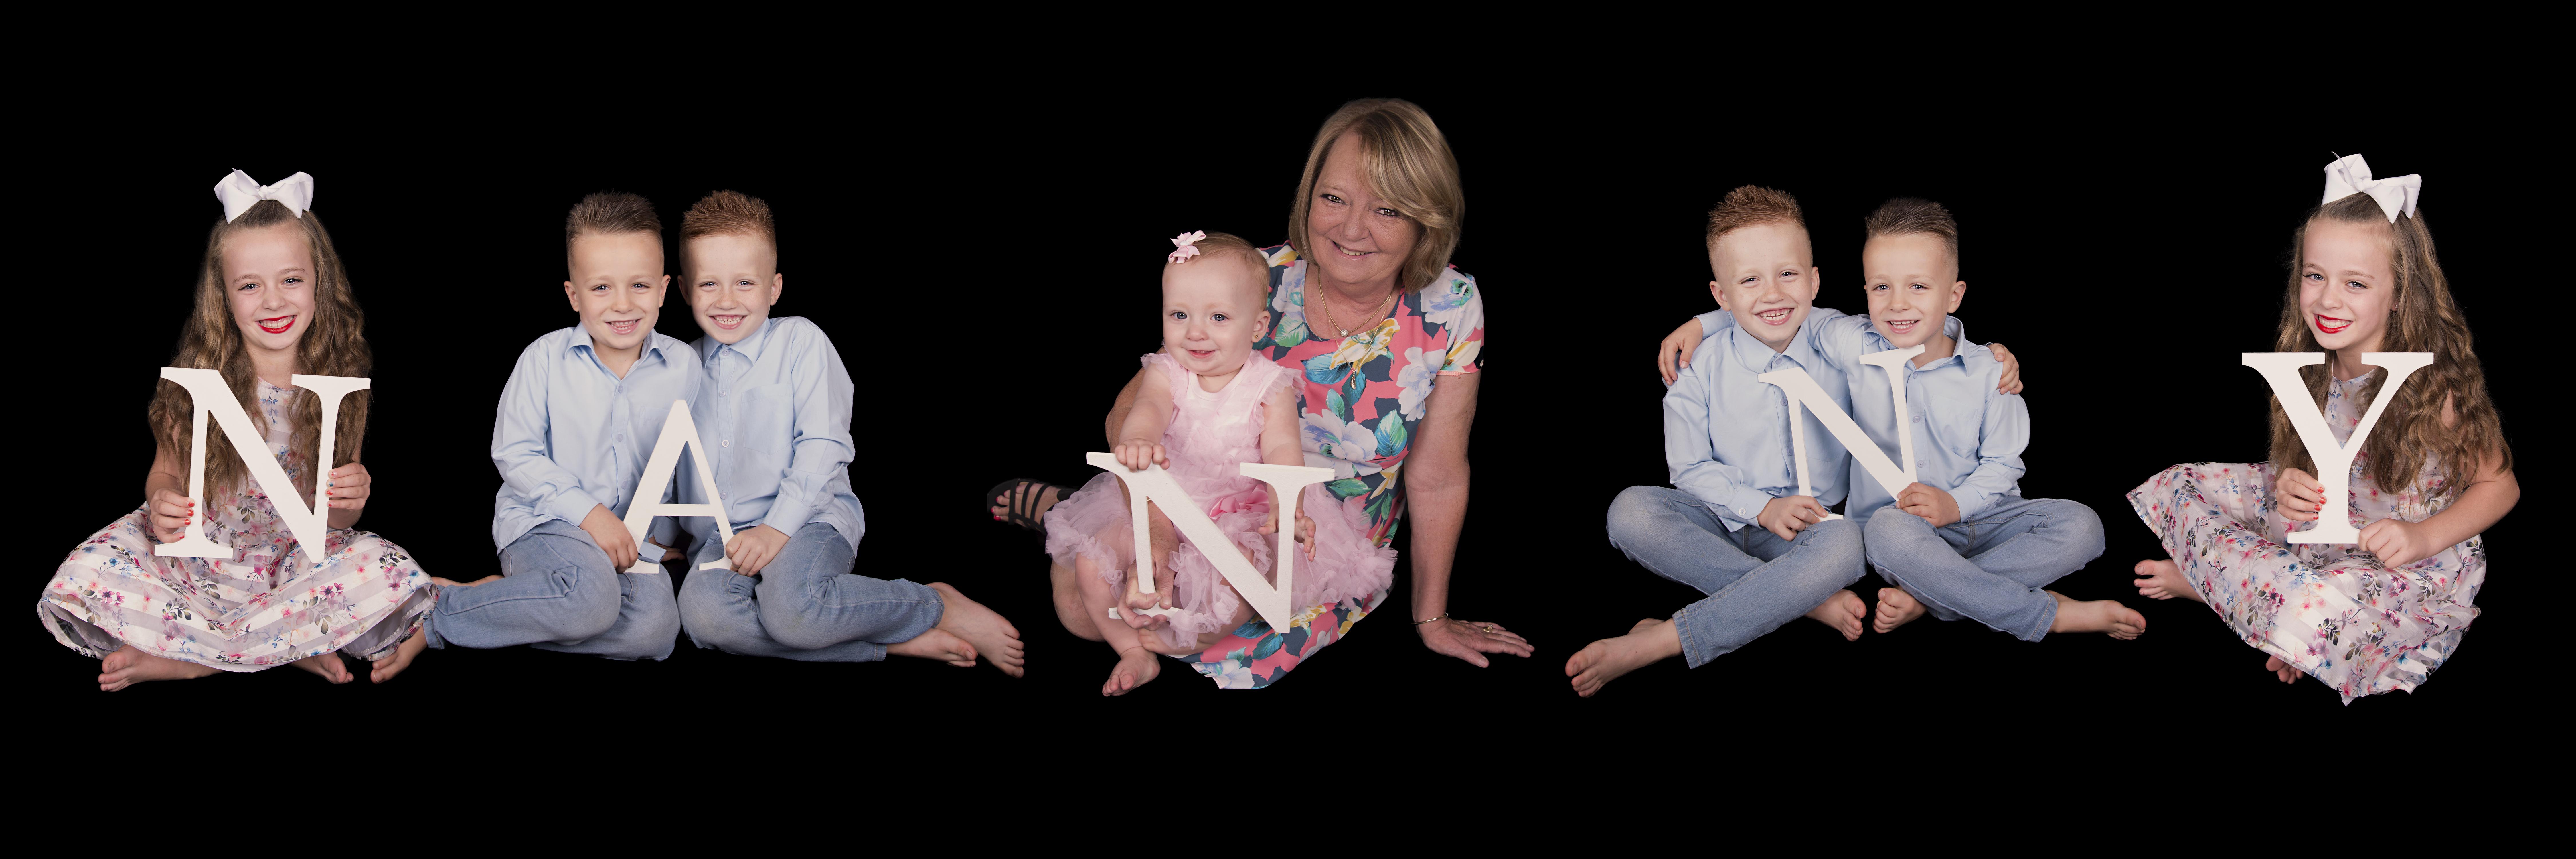 Family Photographer, Basildon